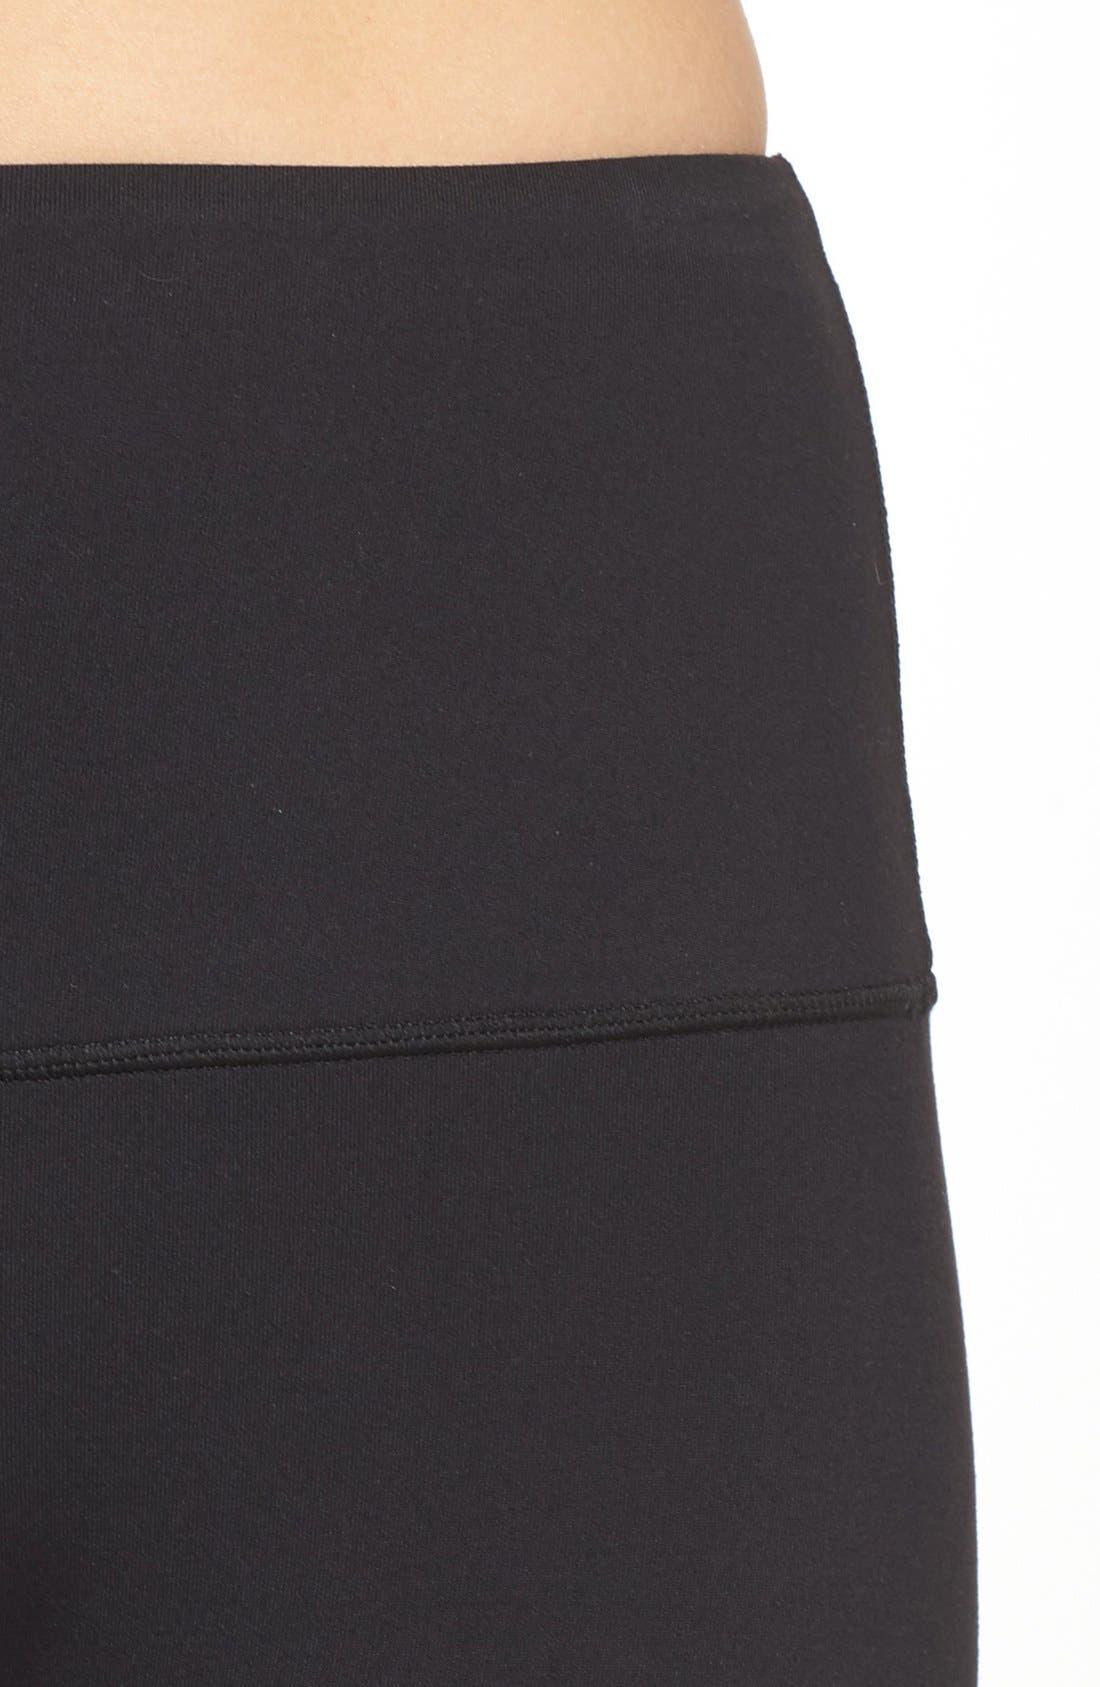 'Bardot' High Waist Leggings,                             Alternate thumbnail 4, color,                             Black